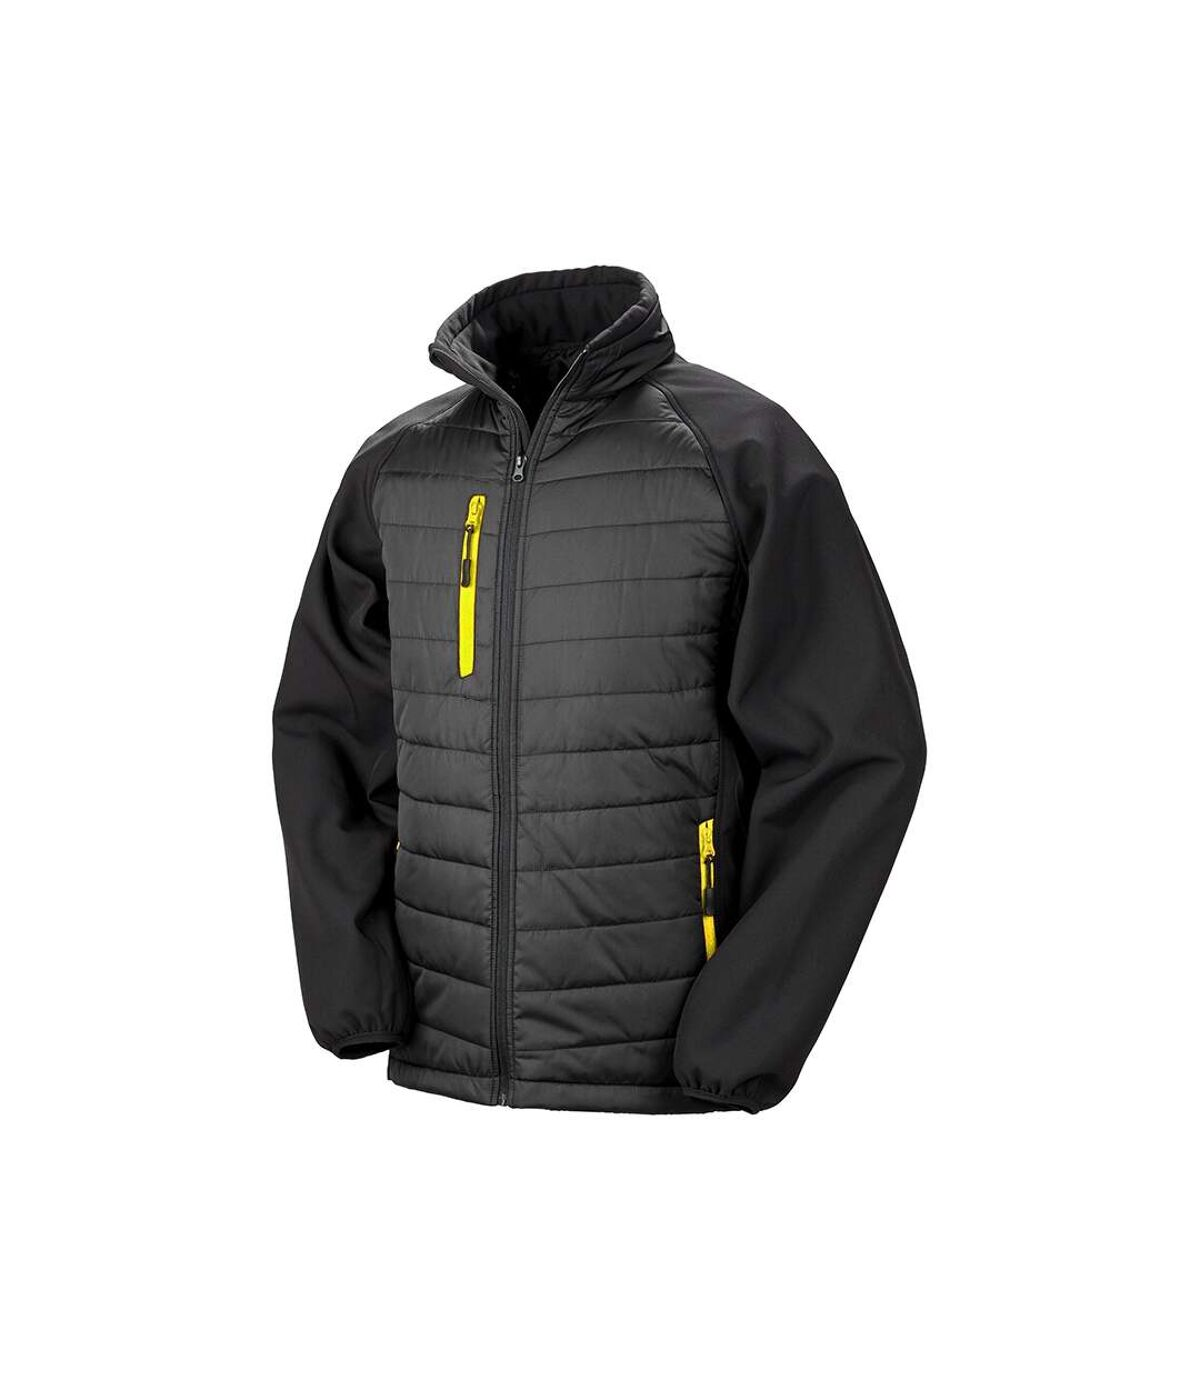 Result Mens Black Compass Padded Soft Shell Jacket (Black/Yellow) - UTPC3326